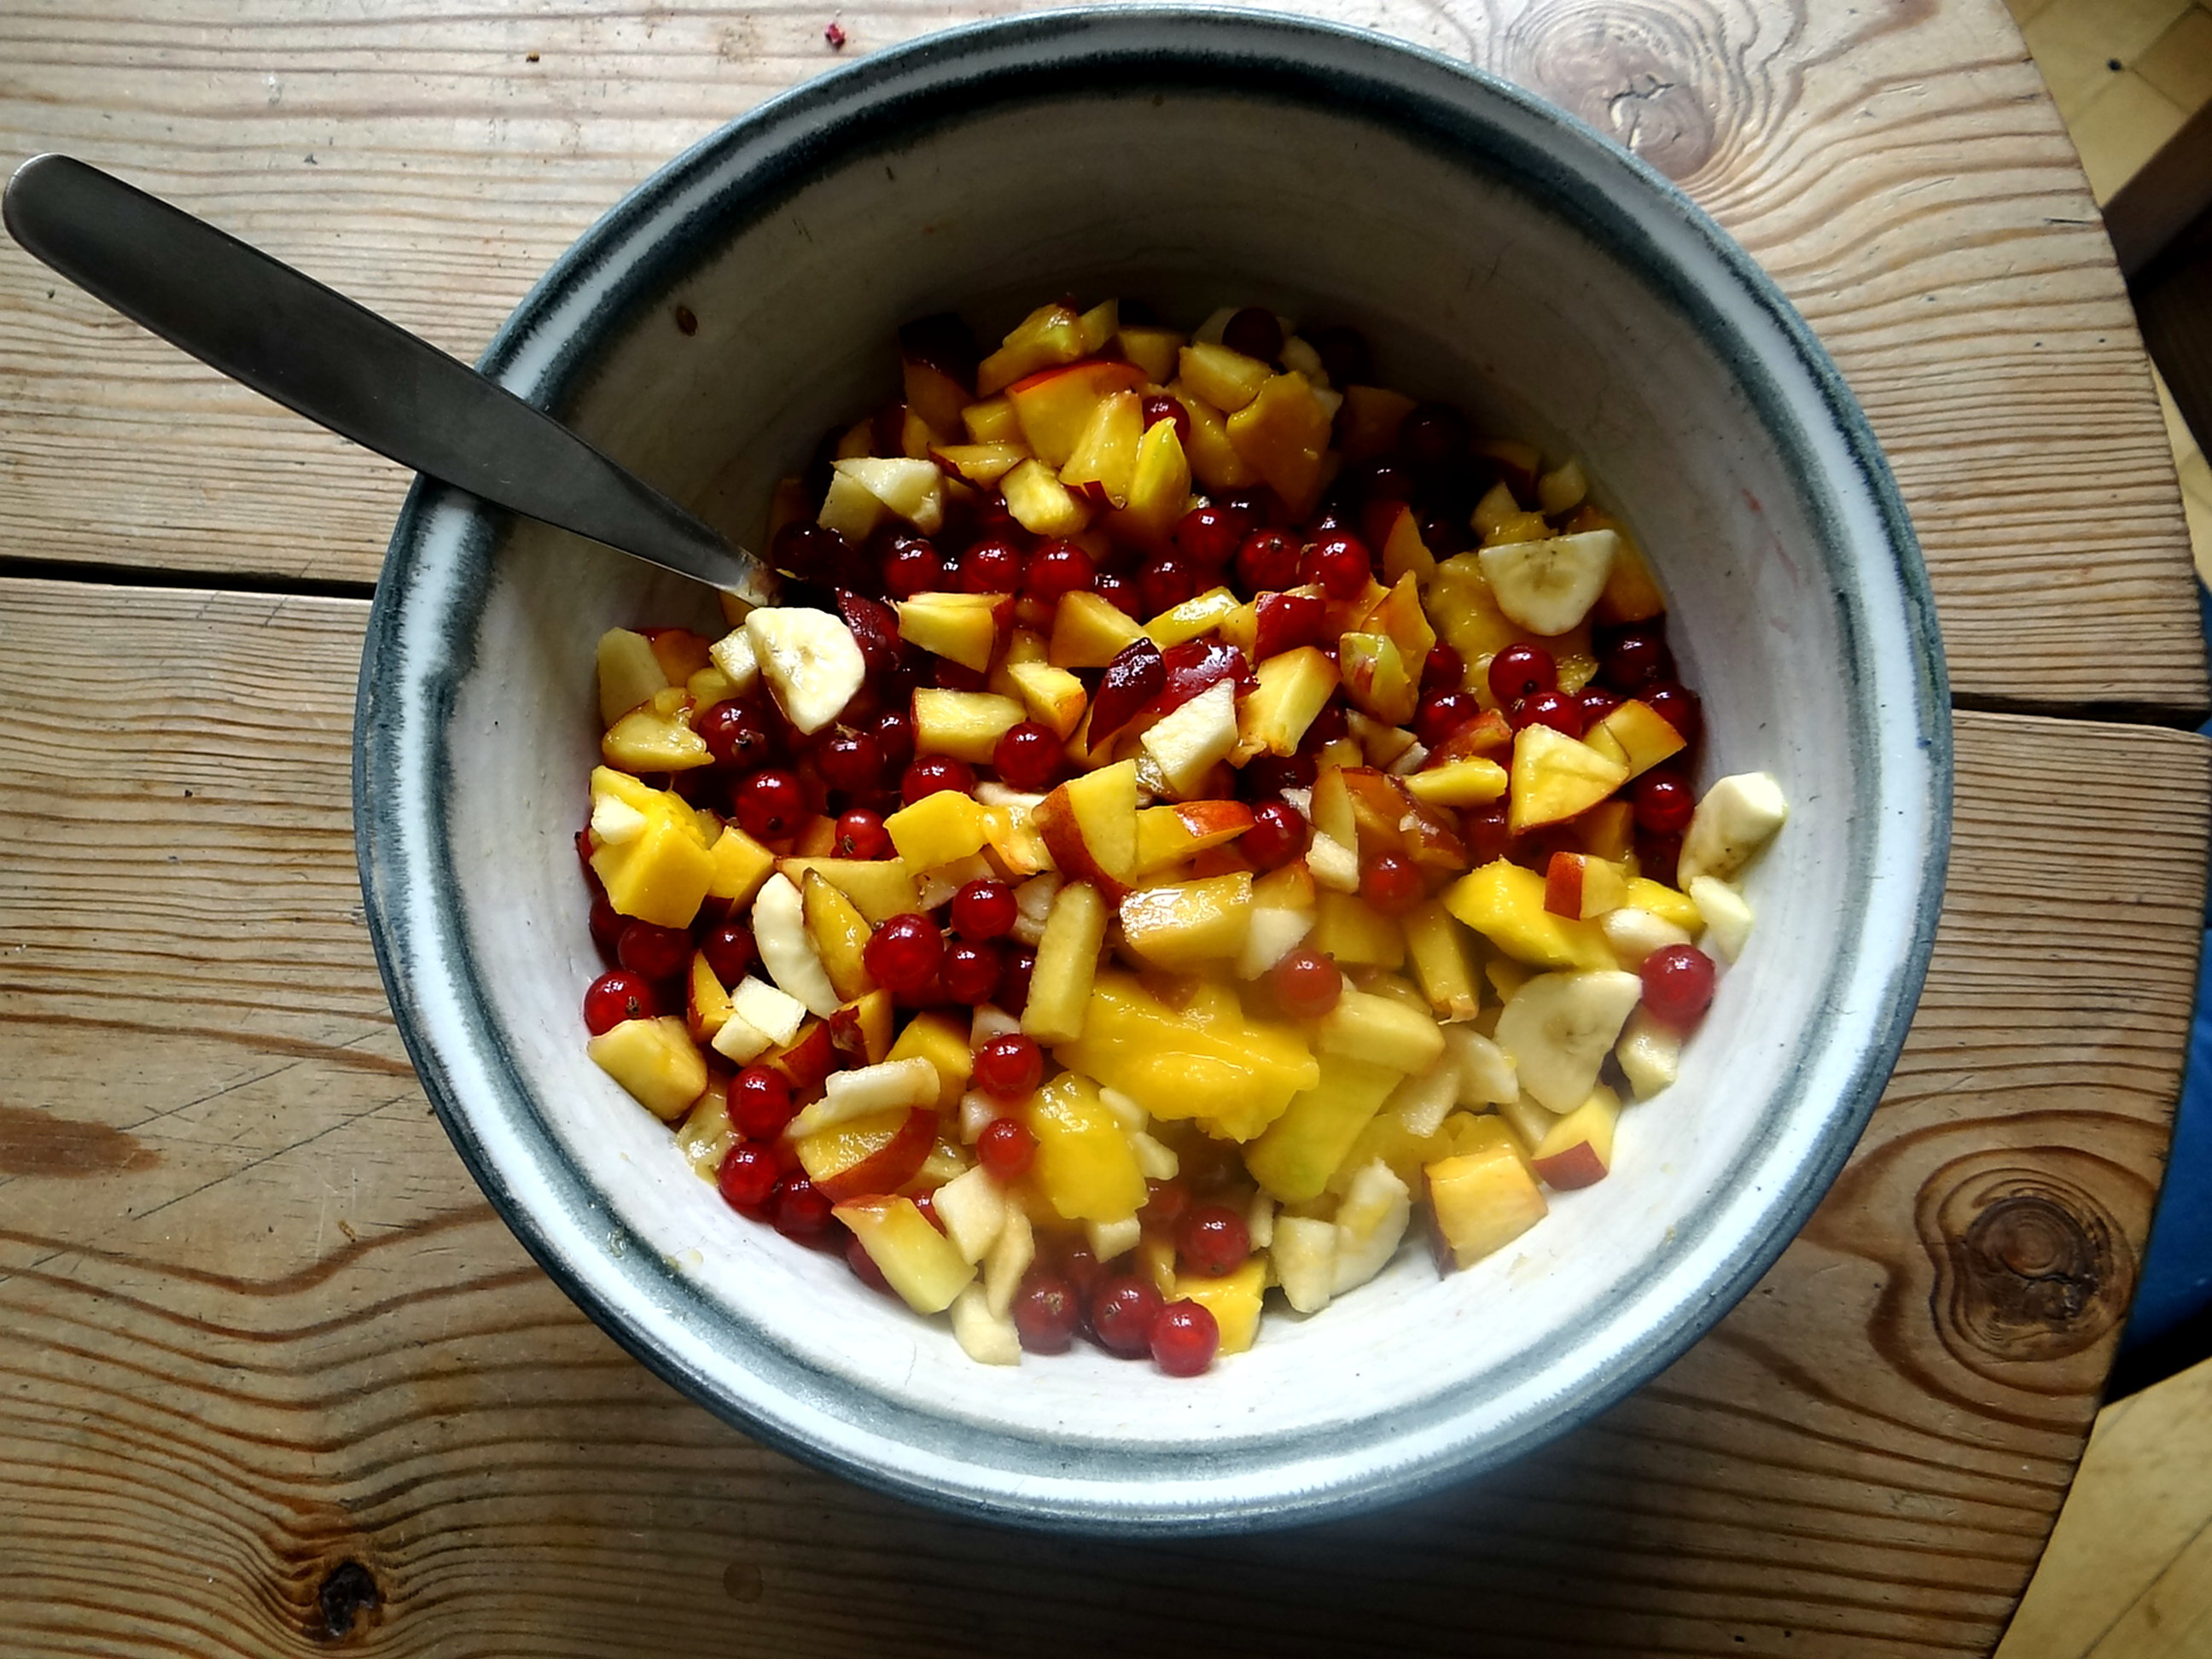 Bohnengemüse,Pellkartoffeln,Obstsalat (13)